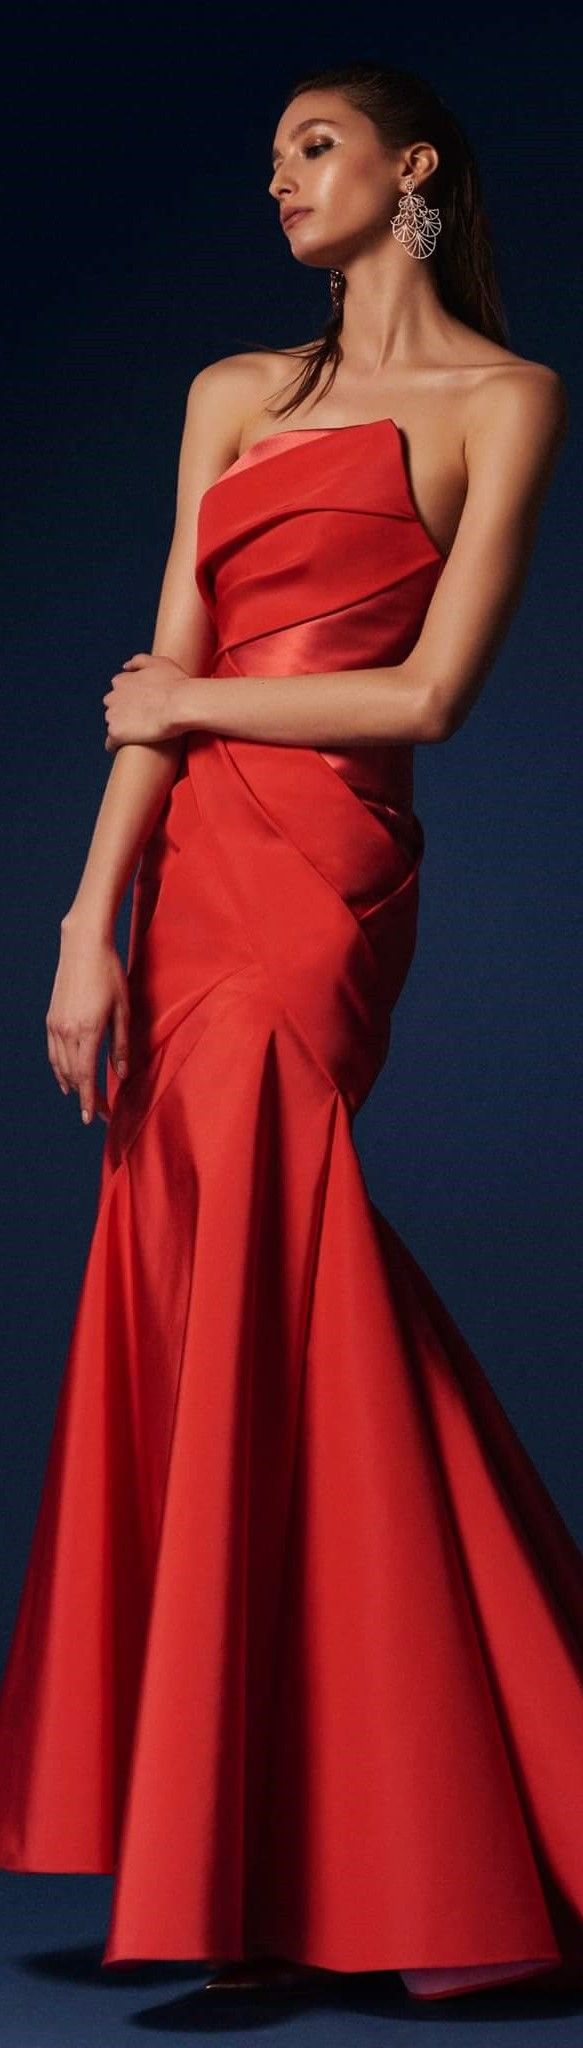 Red and black wedding dress  Rubin Singer pre fall   Evening u wedding dress  Pinterest